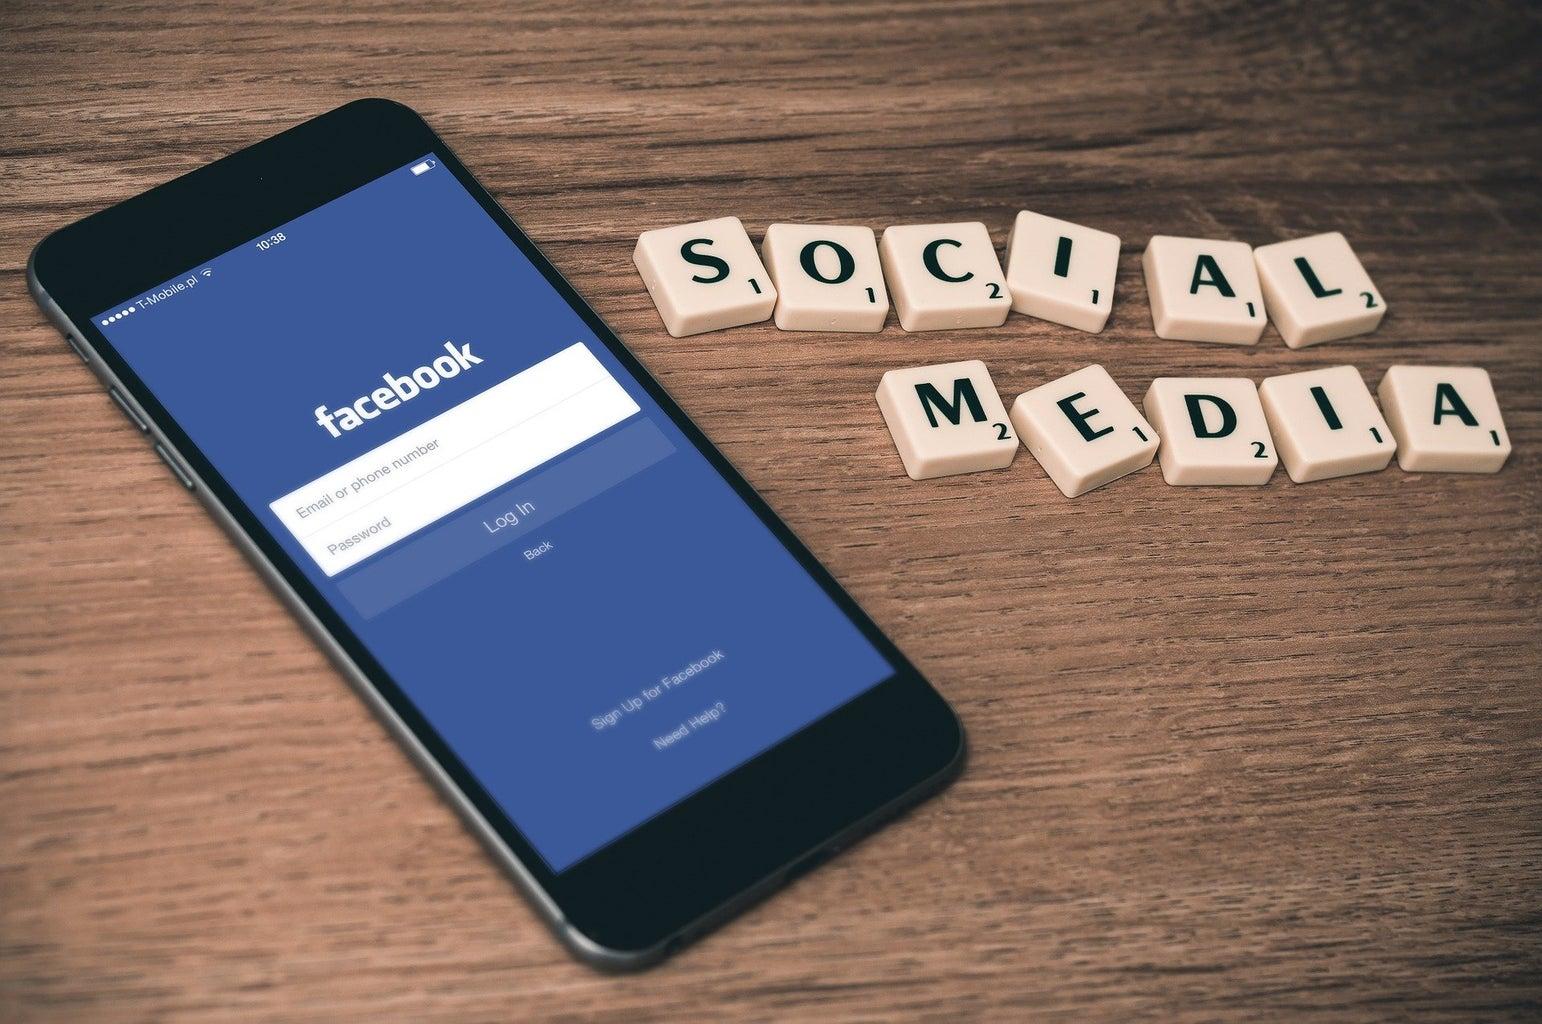 facebook login on phone with social media scrabble tiles